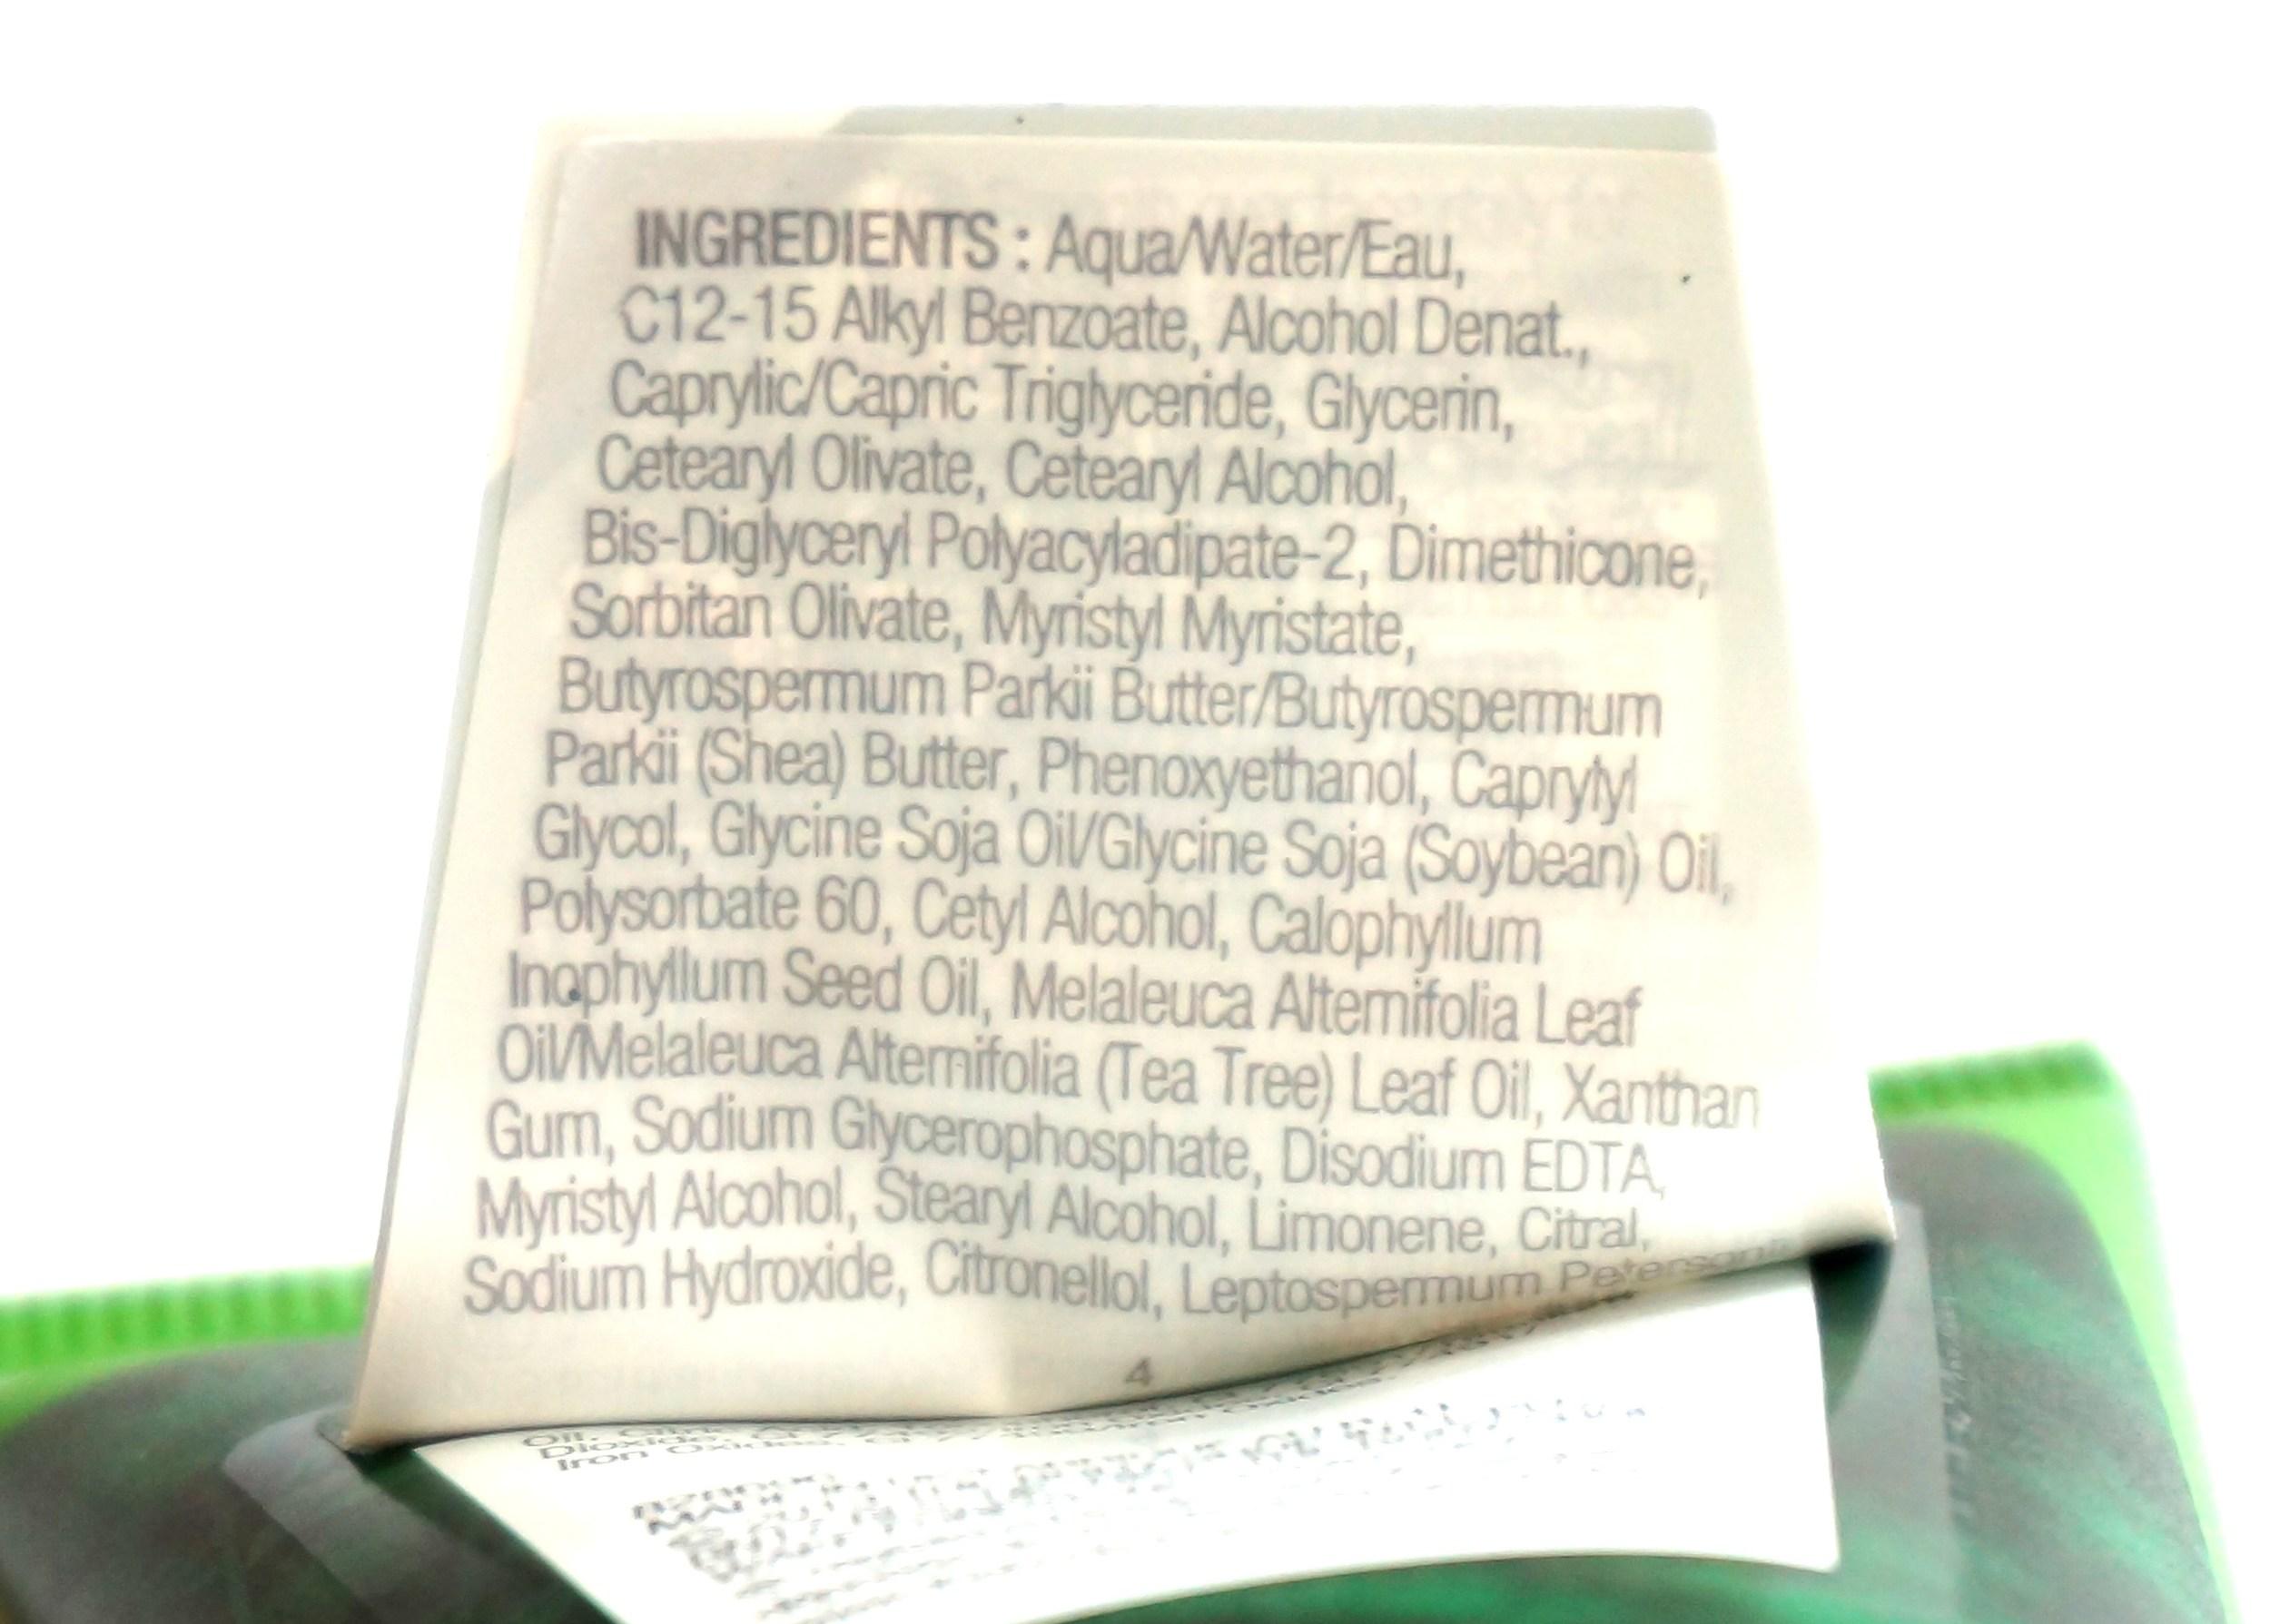 Aqua/Water/Eau (Solvent), C12-15 Alkyl Benzoate (Emollient), Alcohol Denat. (Solvent), Caprylic/Capric Triglyceride (Emollient), Glycerin (Humectant), Cetearyl Olivate (Skin Conditioning Agent), Cetearyl Alcohol (Emulsifier), Bis-Diglyceryl Polyacyladipate-2 (Emollient), Dimethicone (Skin Conditioning Agent), Sorbitan Olivate (Emulsifying Agent), Myristyl Myristate (Emollient), Butyrospermum Parkii Butter/Butyrospermum Parkii (Shea) Butter (Skin Conditioning Agent - Emollient), Phenoxyethanol (Preservative), Caprylyl Glycol (Skin Conditioning Agent), Glycine Soja Oil/Glycine Soja (Soybean) Oil (Emollient/Skin Conditioner), Polysorbate 60 (Surfactant), Cetyl Alcohol (Emulsifier), Calophyllum Inophyllum Seed Oil (Skin Conditioning Agent), Melaleuca Alternifolia Leaf Oil/Melaleuca Alternifolia (Tea Tree) Leaf Oil (Natural Additive), Xanthan Gum (Viscosity Modifier), Sodium Glycerophosphate (Oral Care Agent), Disodium EDTA (Chelating Agent), Myristyl Alcohol (Emulsifier/Emollient), Stearyl Alcohol (Emollient), Limonene (Fragrance Ingredient), Citral (Fragrance Ingredient), Sodium Hydroxide (pH Adjuster), Citronellol (Fragrance Ingredient), Leptospermum Petersonii Oil (Fragrance Ingredient), Citric Acid (pH Adjuster), Tocopherol (Antioxidant), CI 77891/Titanium Dioxide (Colorant), CI 77492/Iron Oxides (Colorant), CI 77499/Iron Oxides (Colour), CI 77491/Iron Oxides (Colorant).